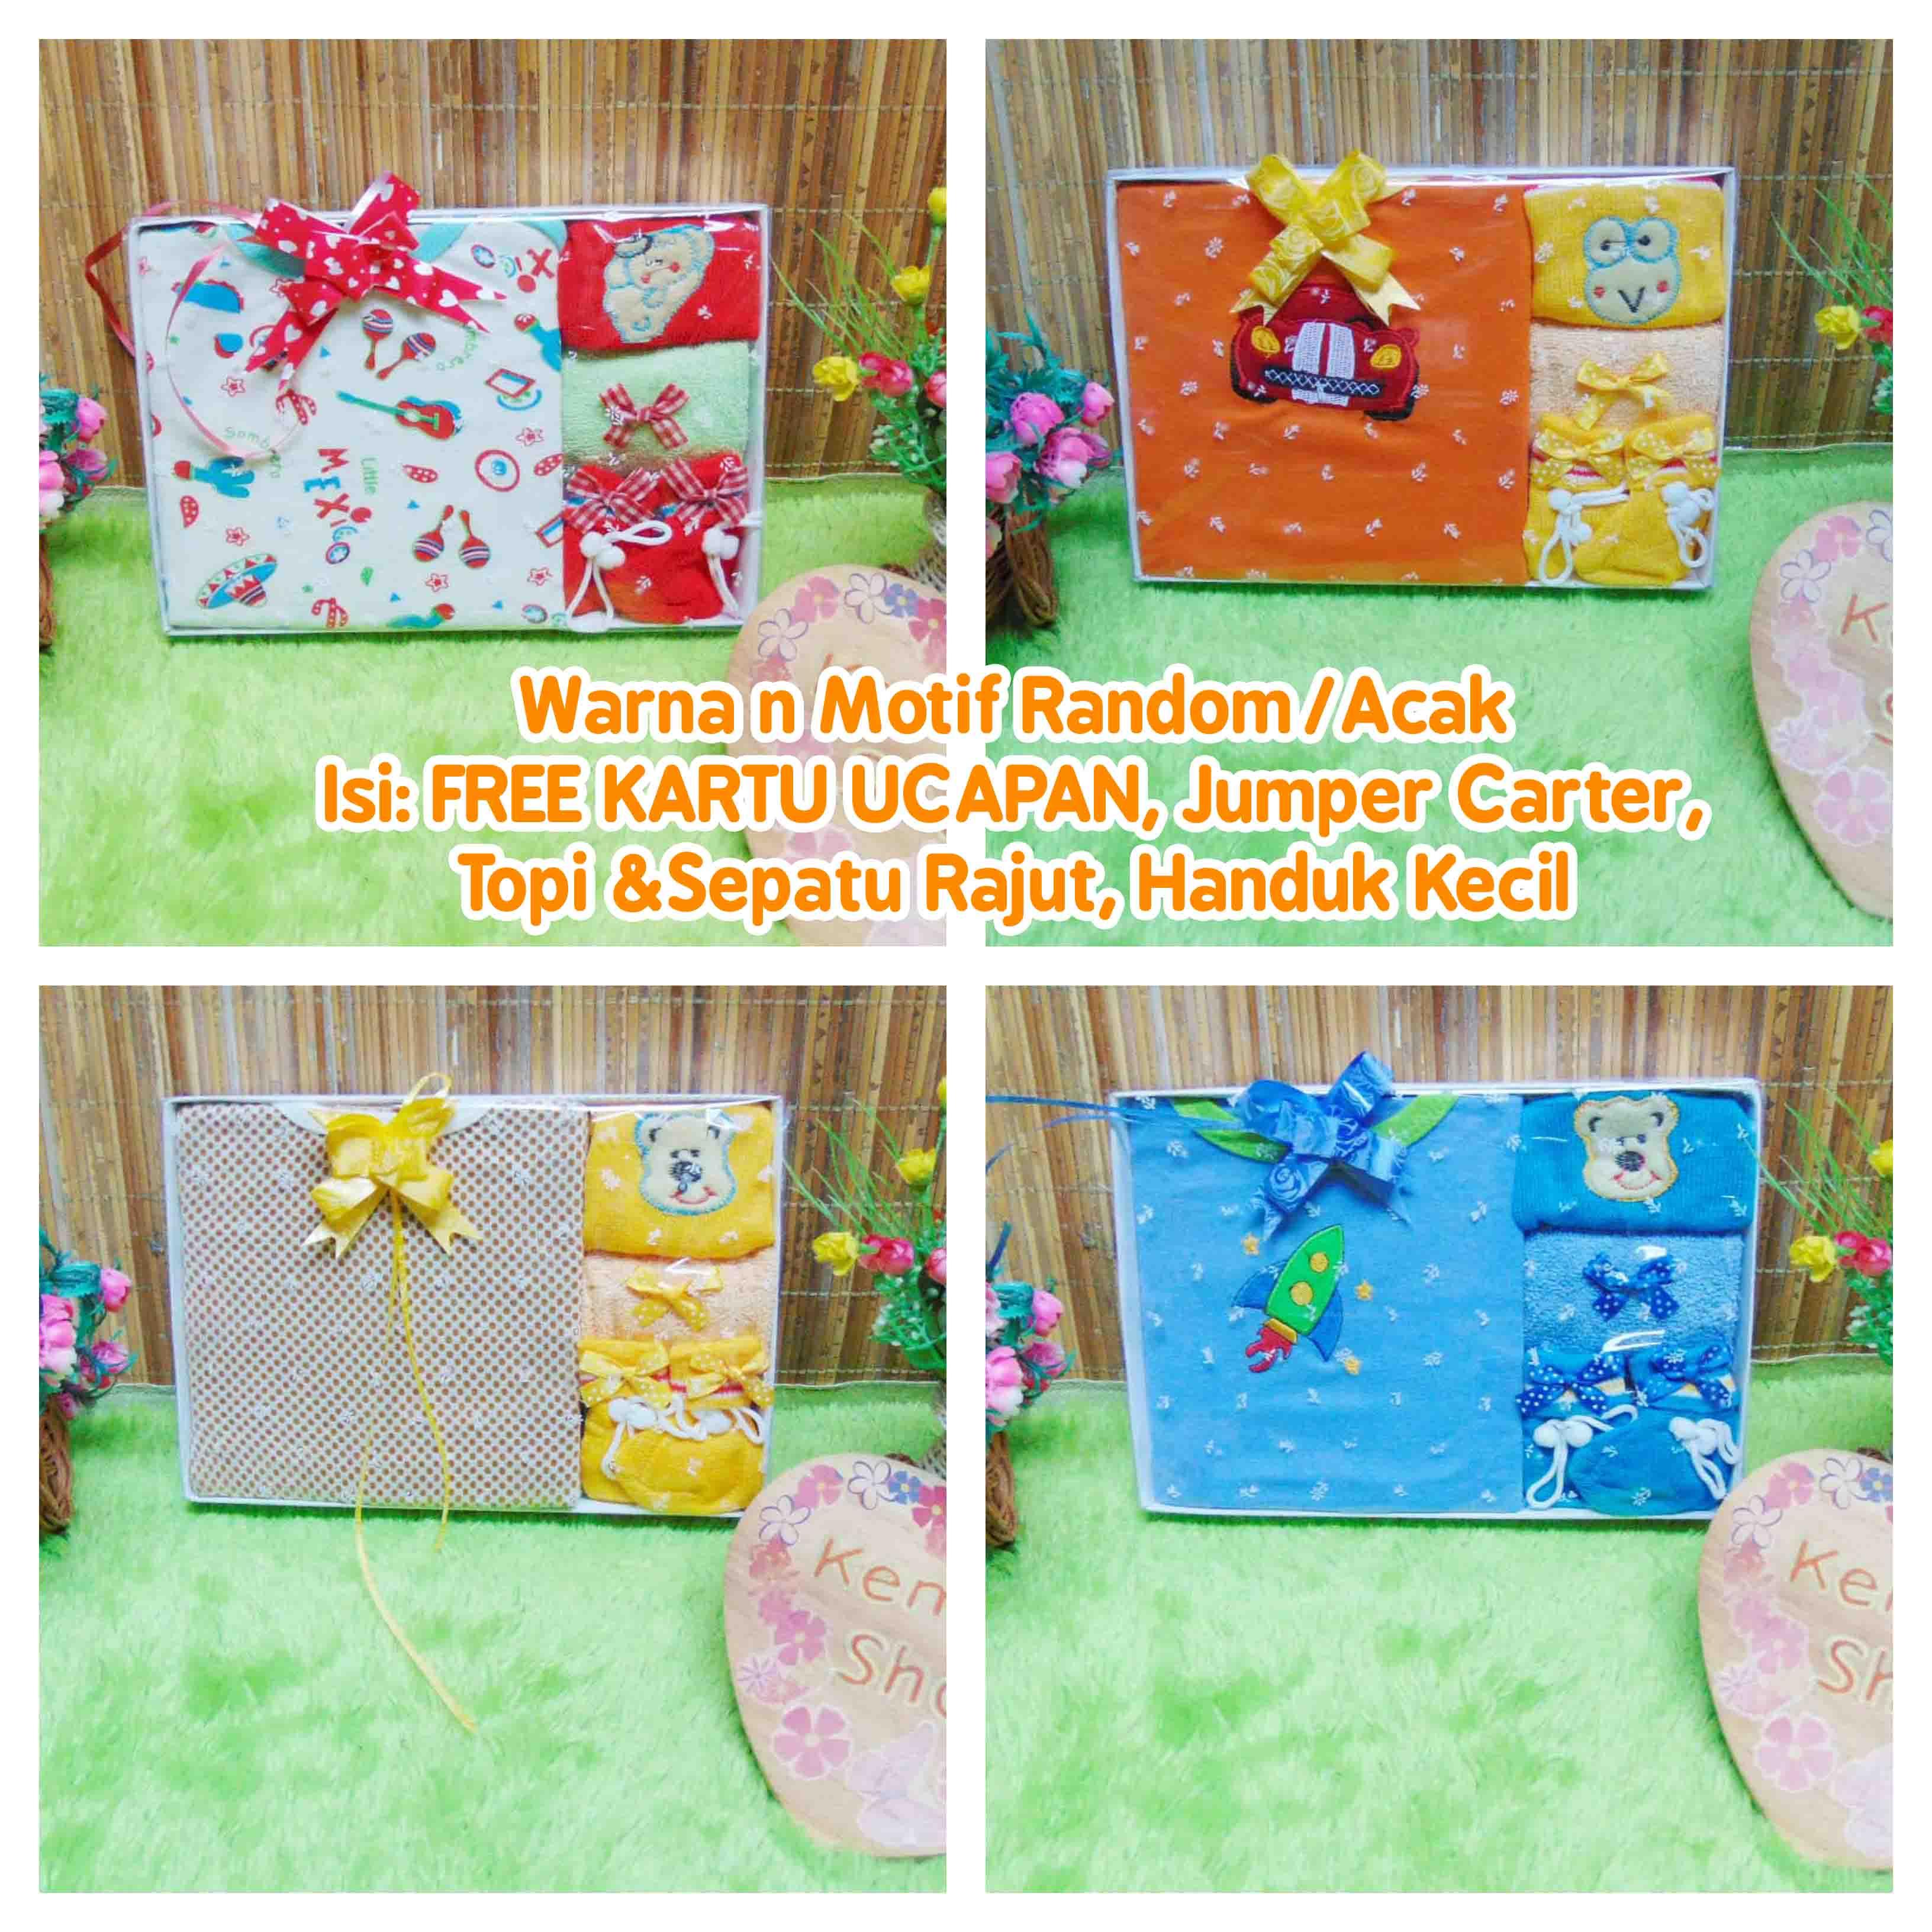 FREE KARTU UCAPAN Hadiah Baby Gift Kado Lahiran Baby Newborn Boy Laki-Laki Box Paket Kado Bayi Jumper Carter n Rajut (2)